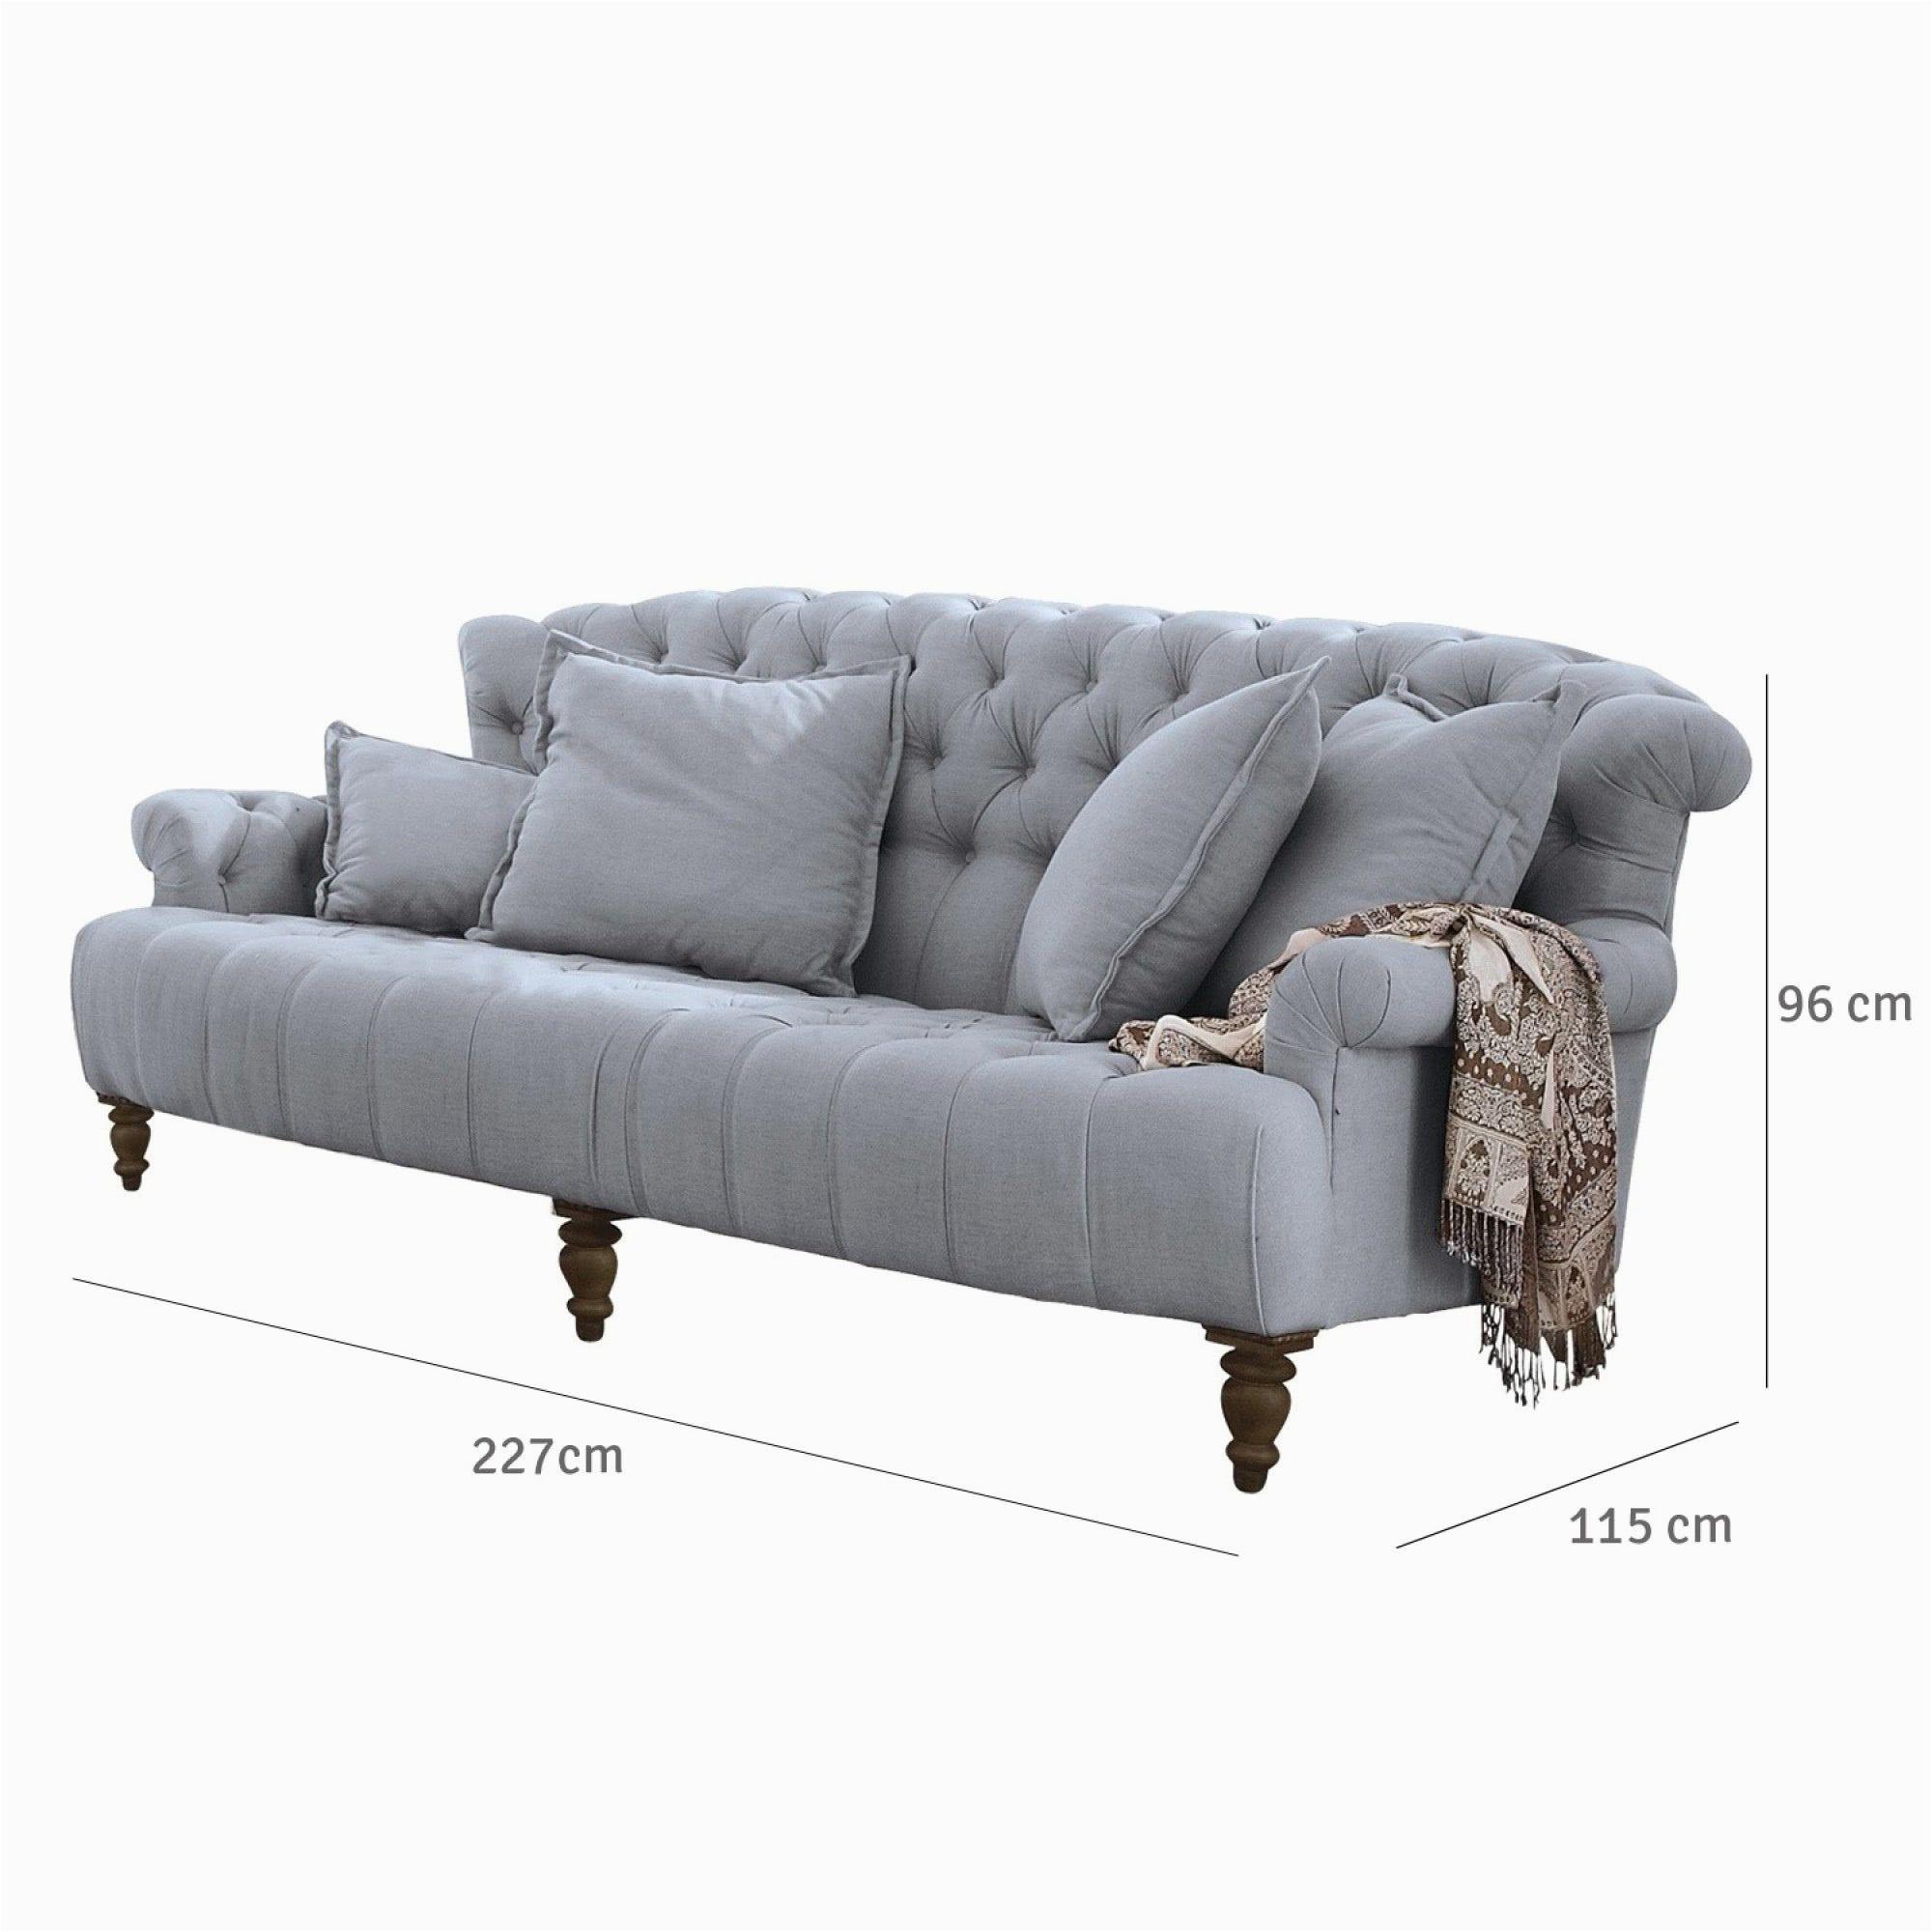 hohes sofa fuer esstisch hohes sofa fuer esstisch barnickel polsterm bel tablesofas elegant 1